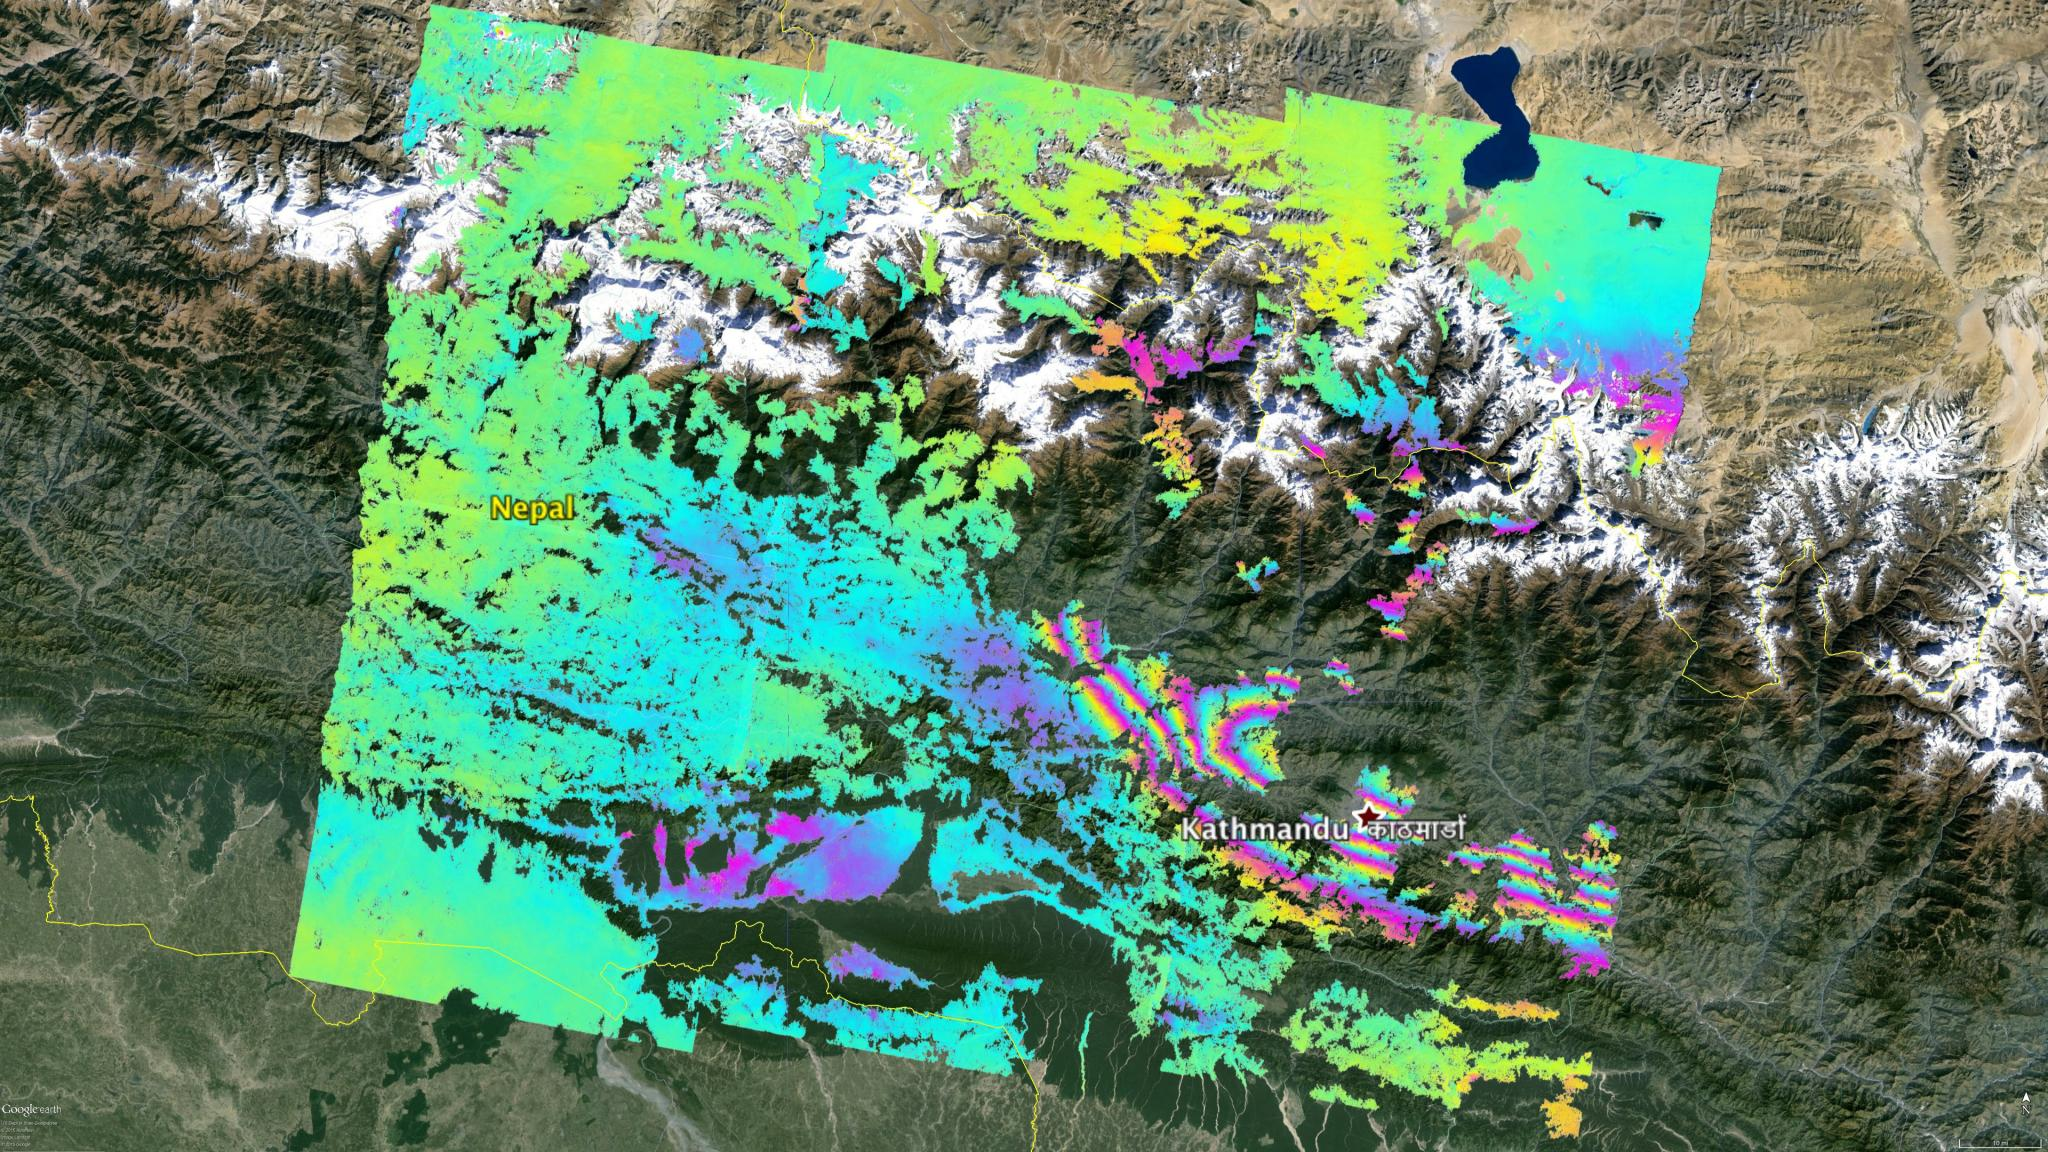 NASA Damage Map To Assist With  Nepal Quake Disaster Response - Washington dc earthquake map